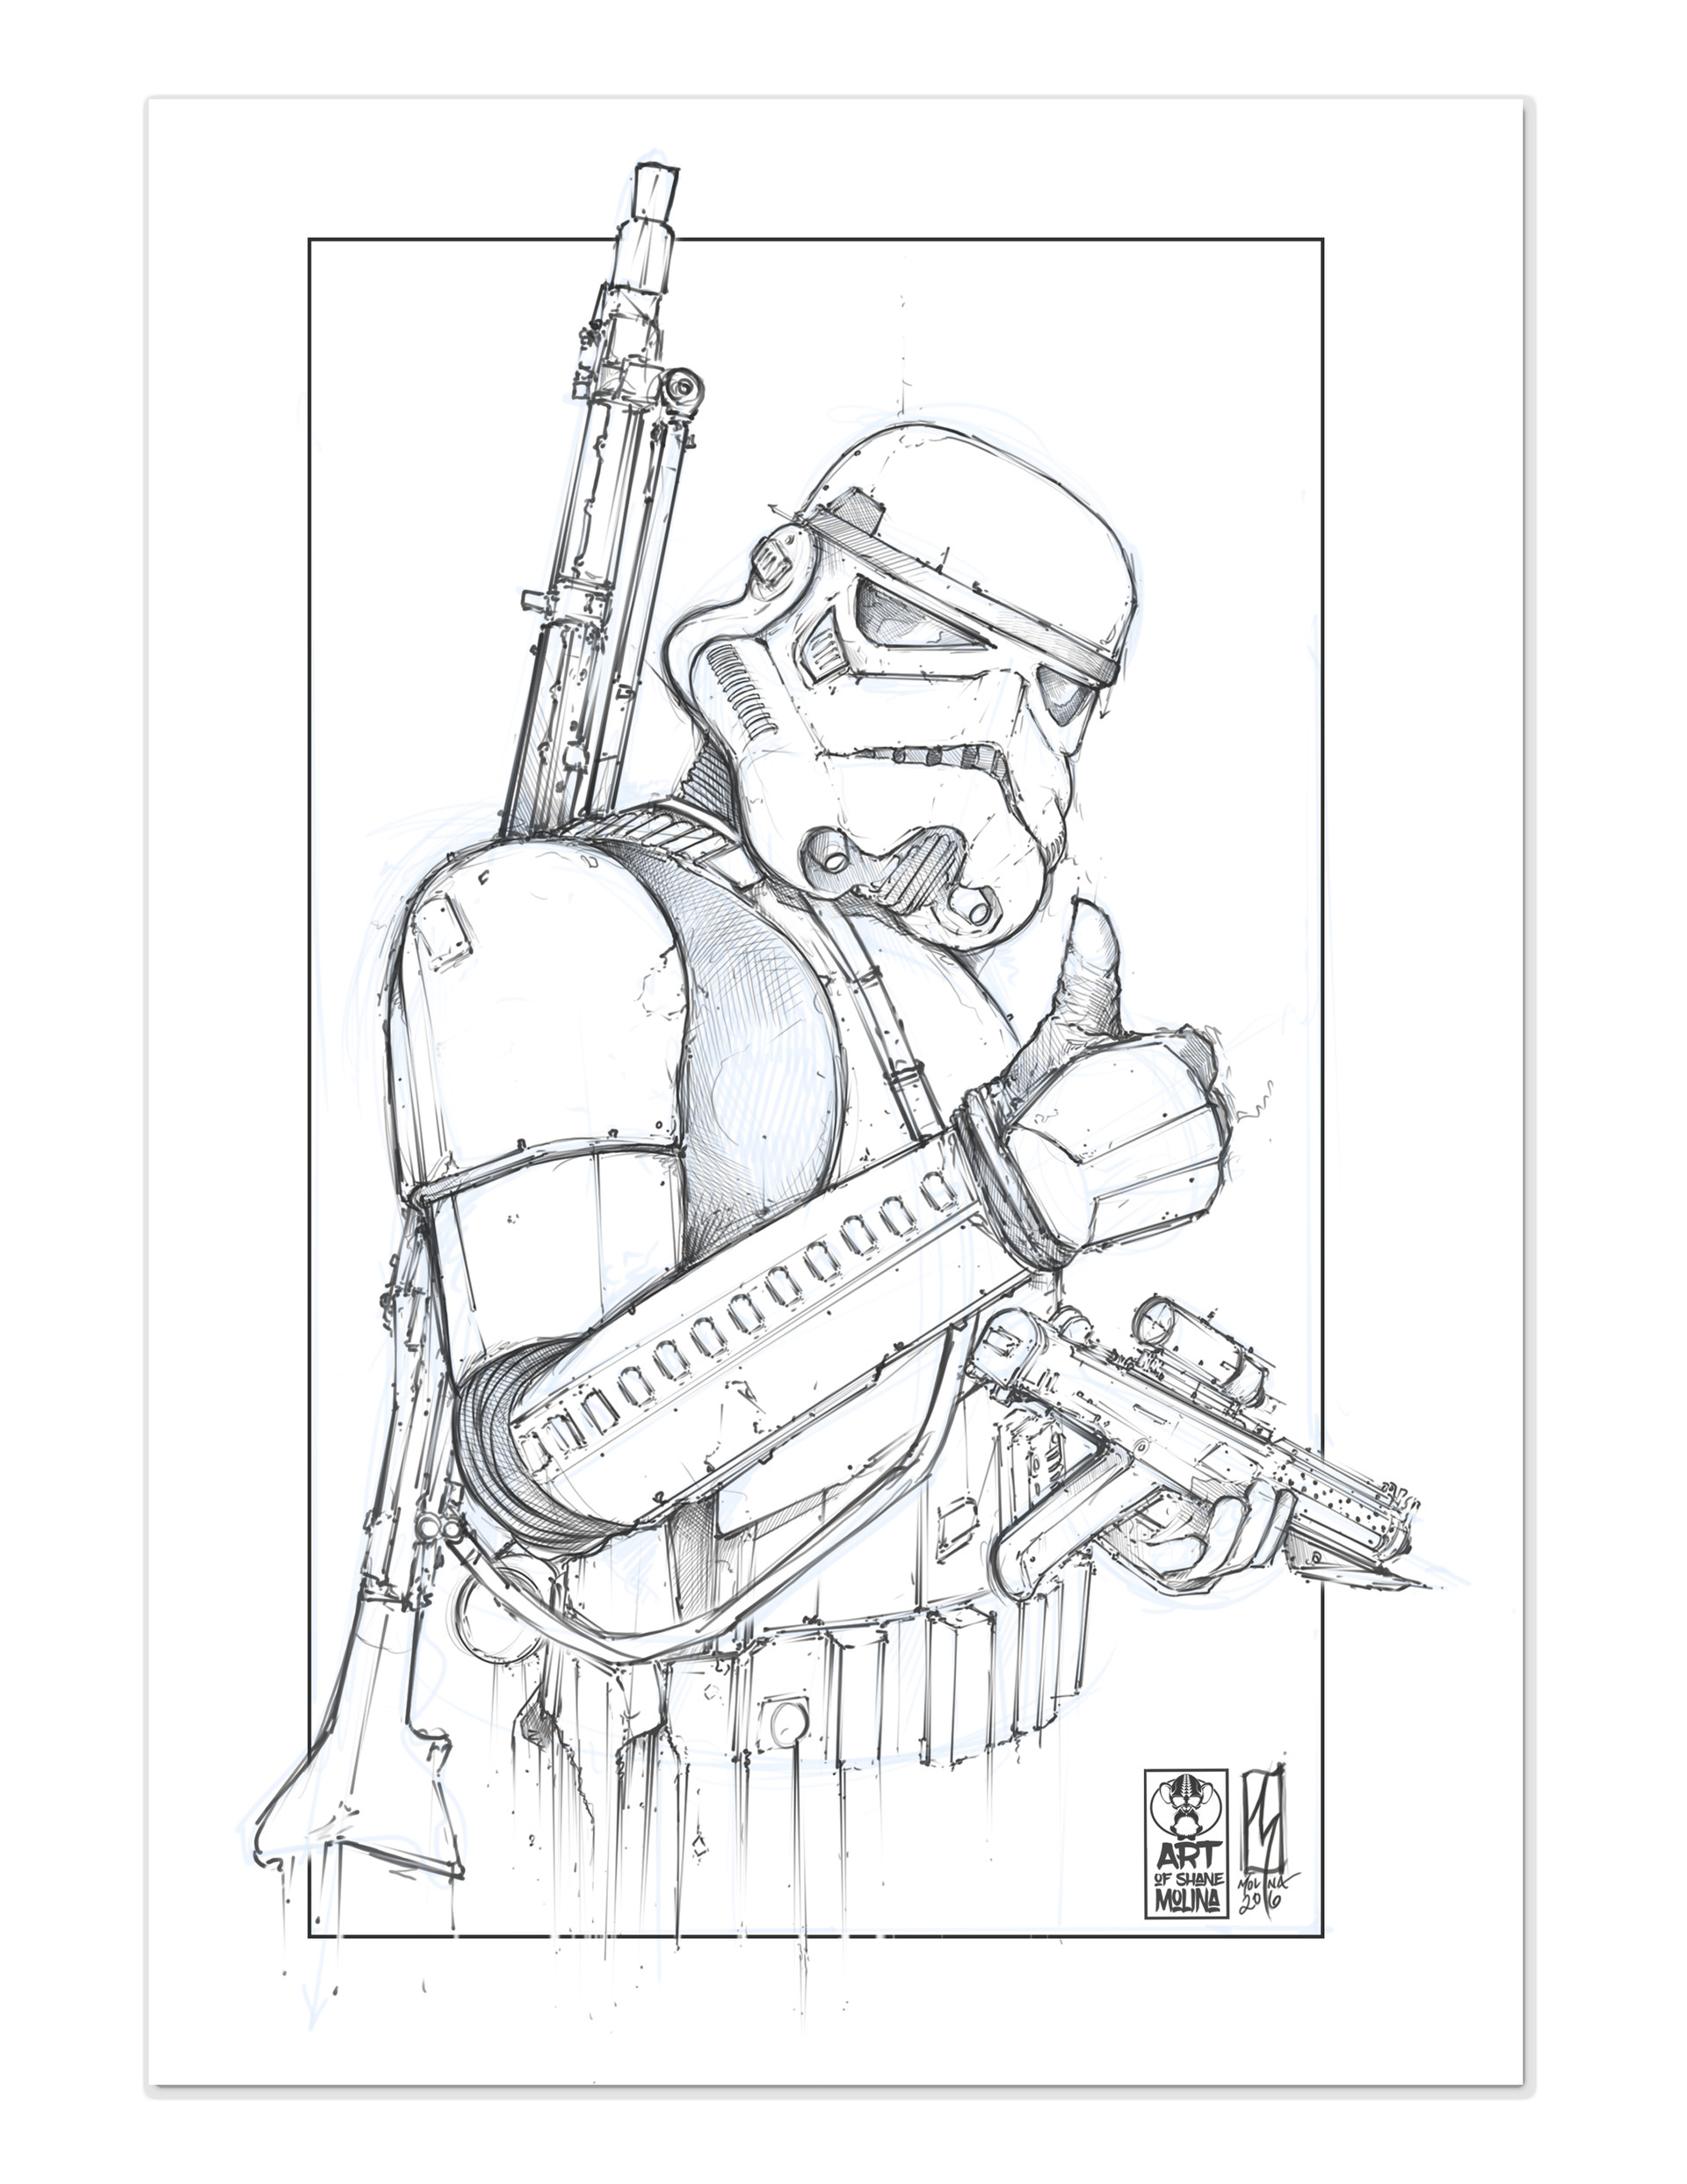 Shane molina 4k stormtrooper printoff 2